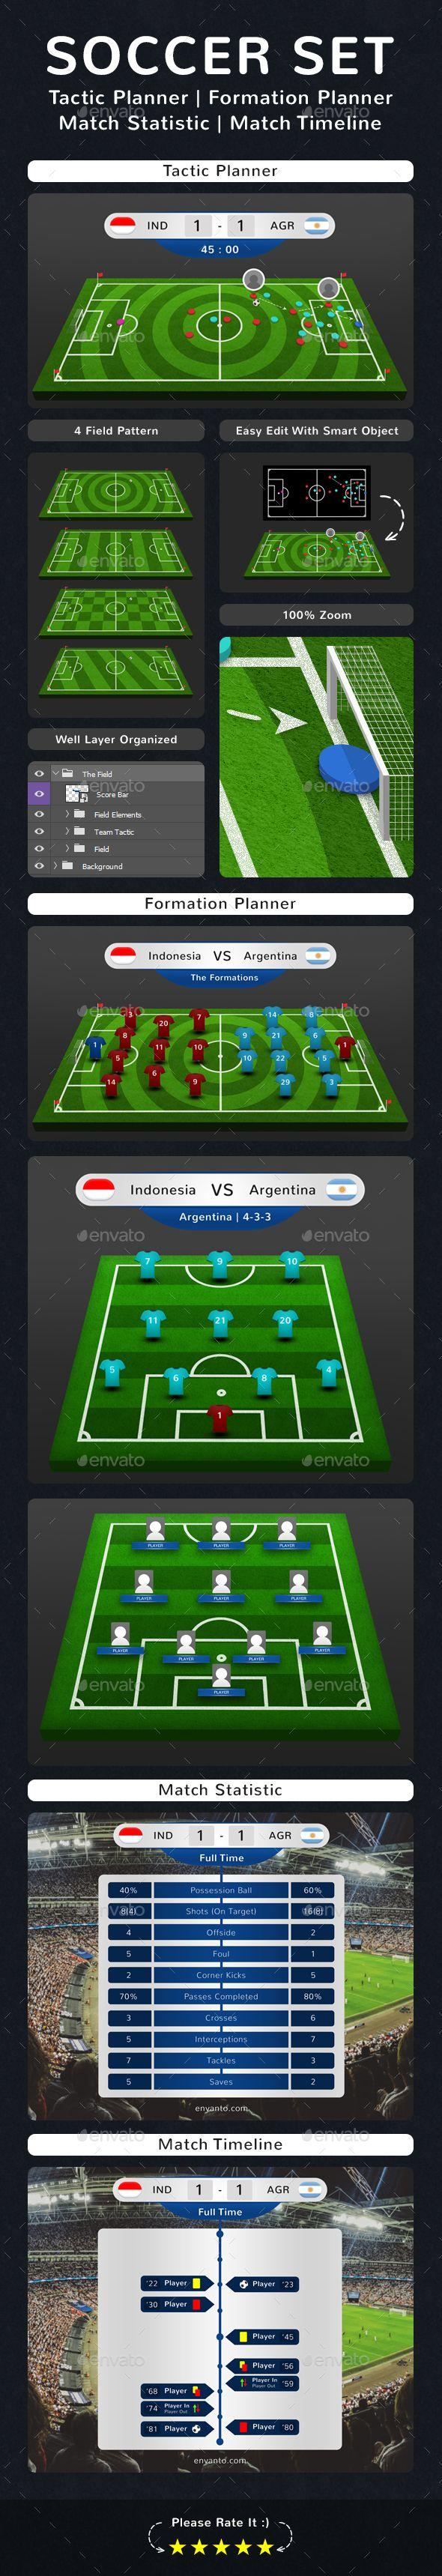 Soccer Set Tactic Formation Statistic Match Timeline Game Design Football Tactics